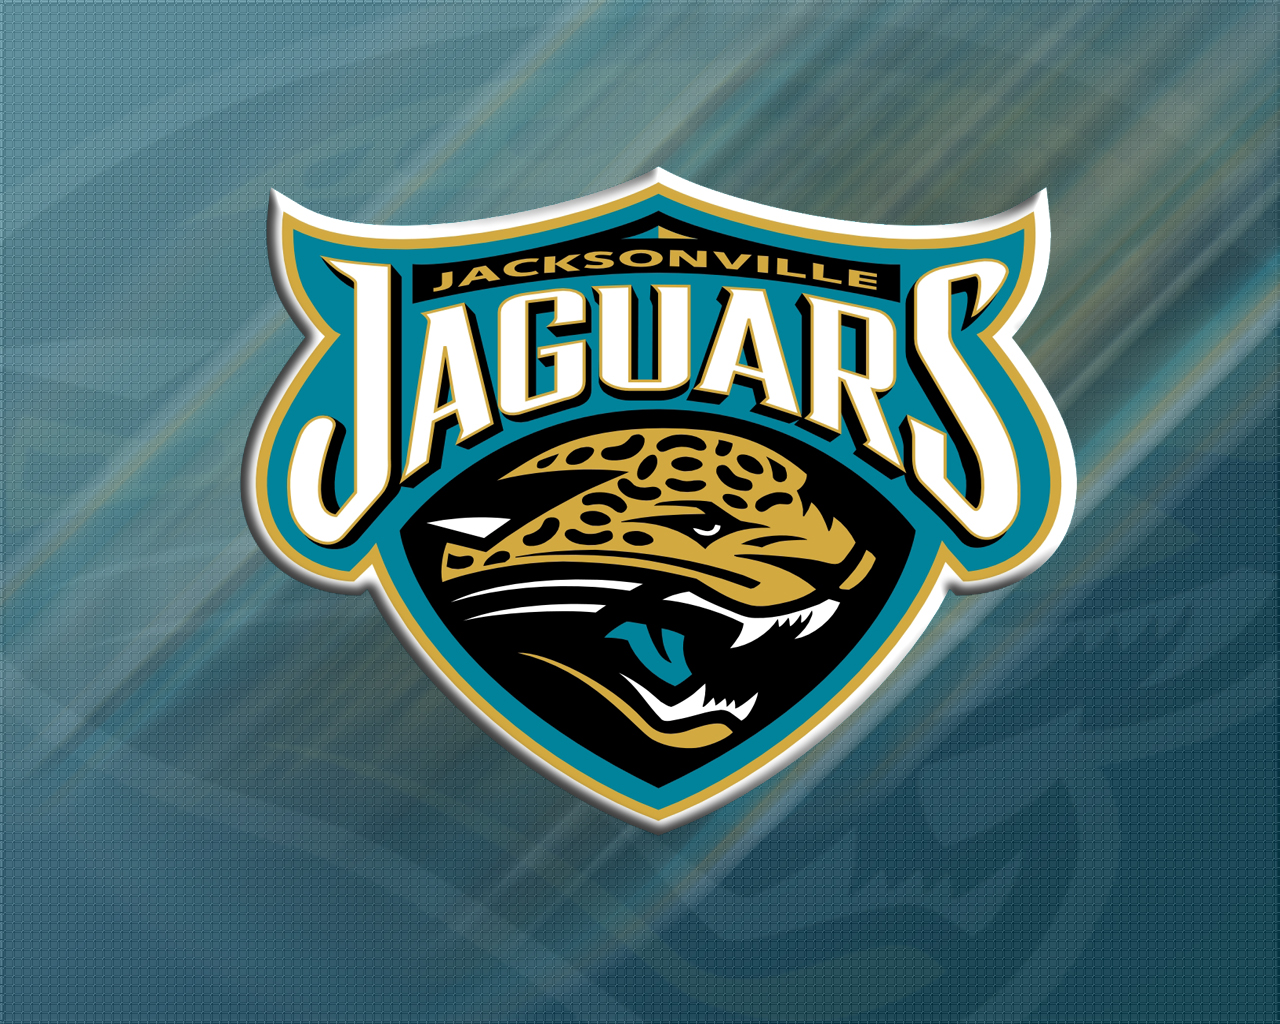 Jacksonville Jaguars Wallpaper 1280x1024